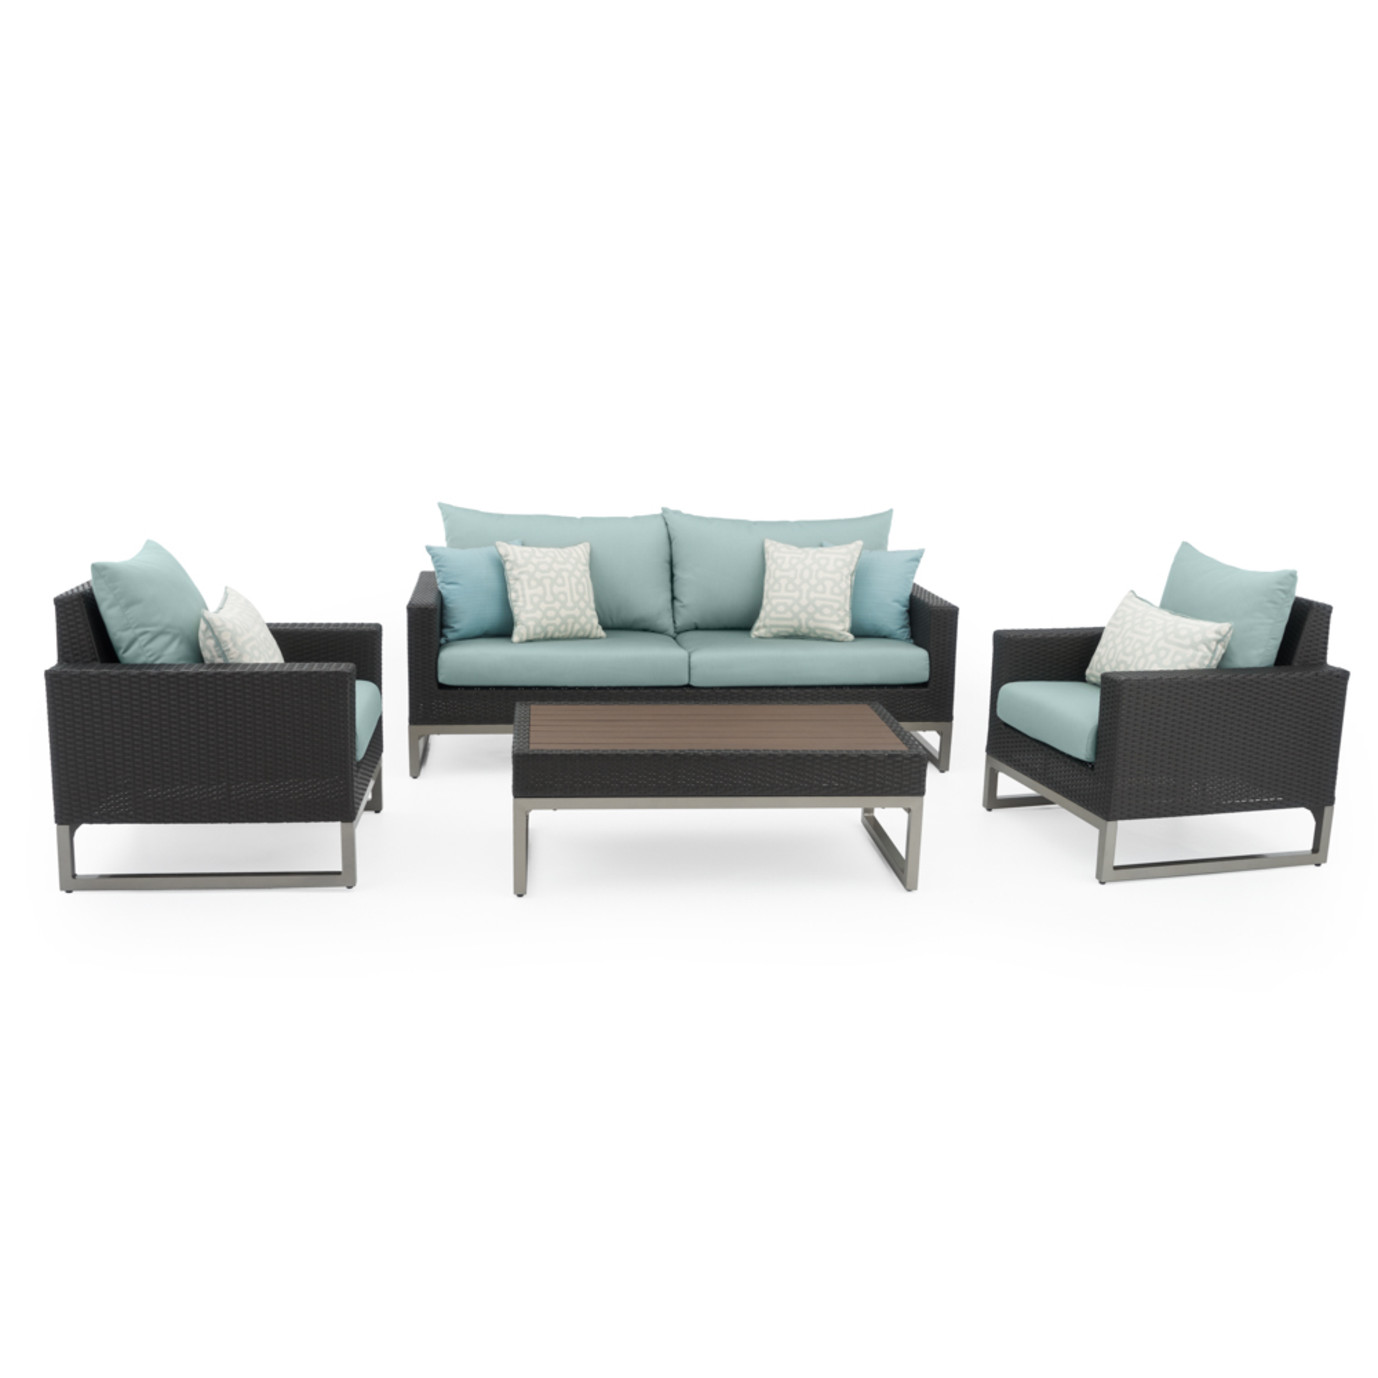 Milo™ Espresso 4pc Seating Set - Spa Blue